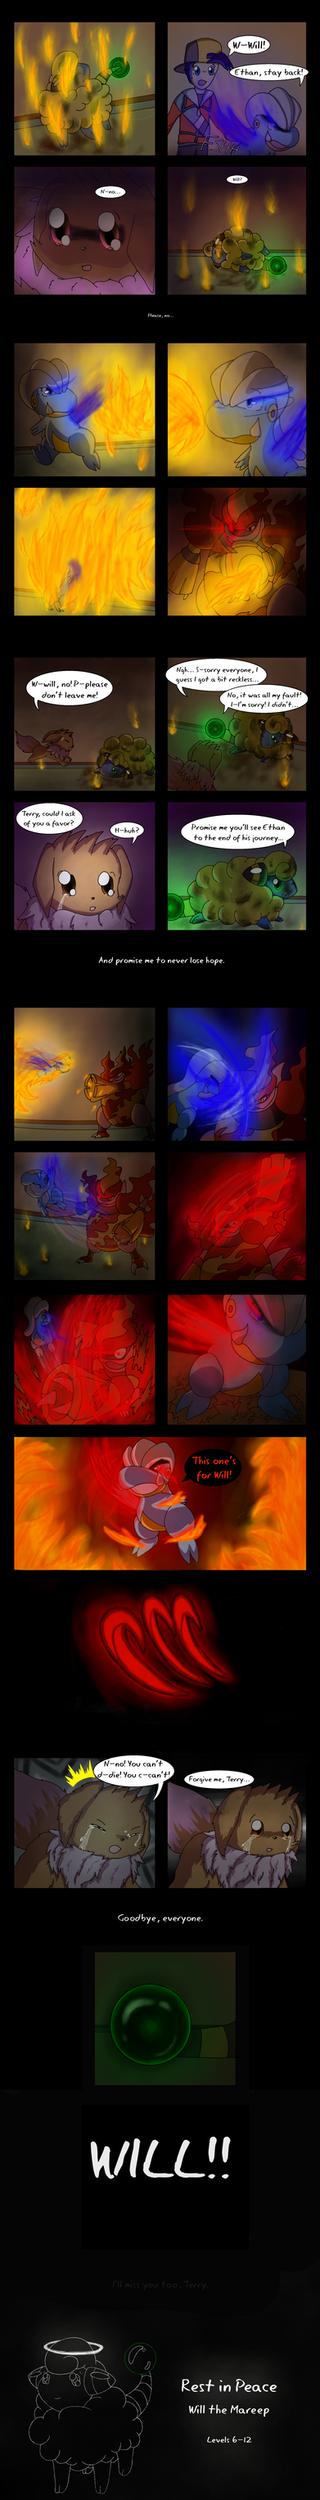 Pandemonium in Johto-Page 19-Extinguished by Supertmuzz